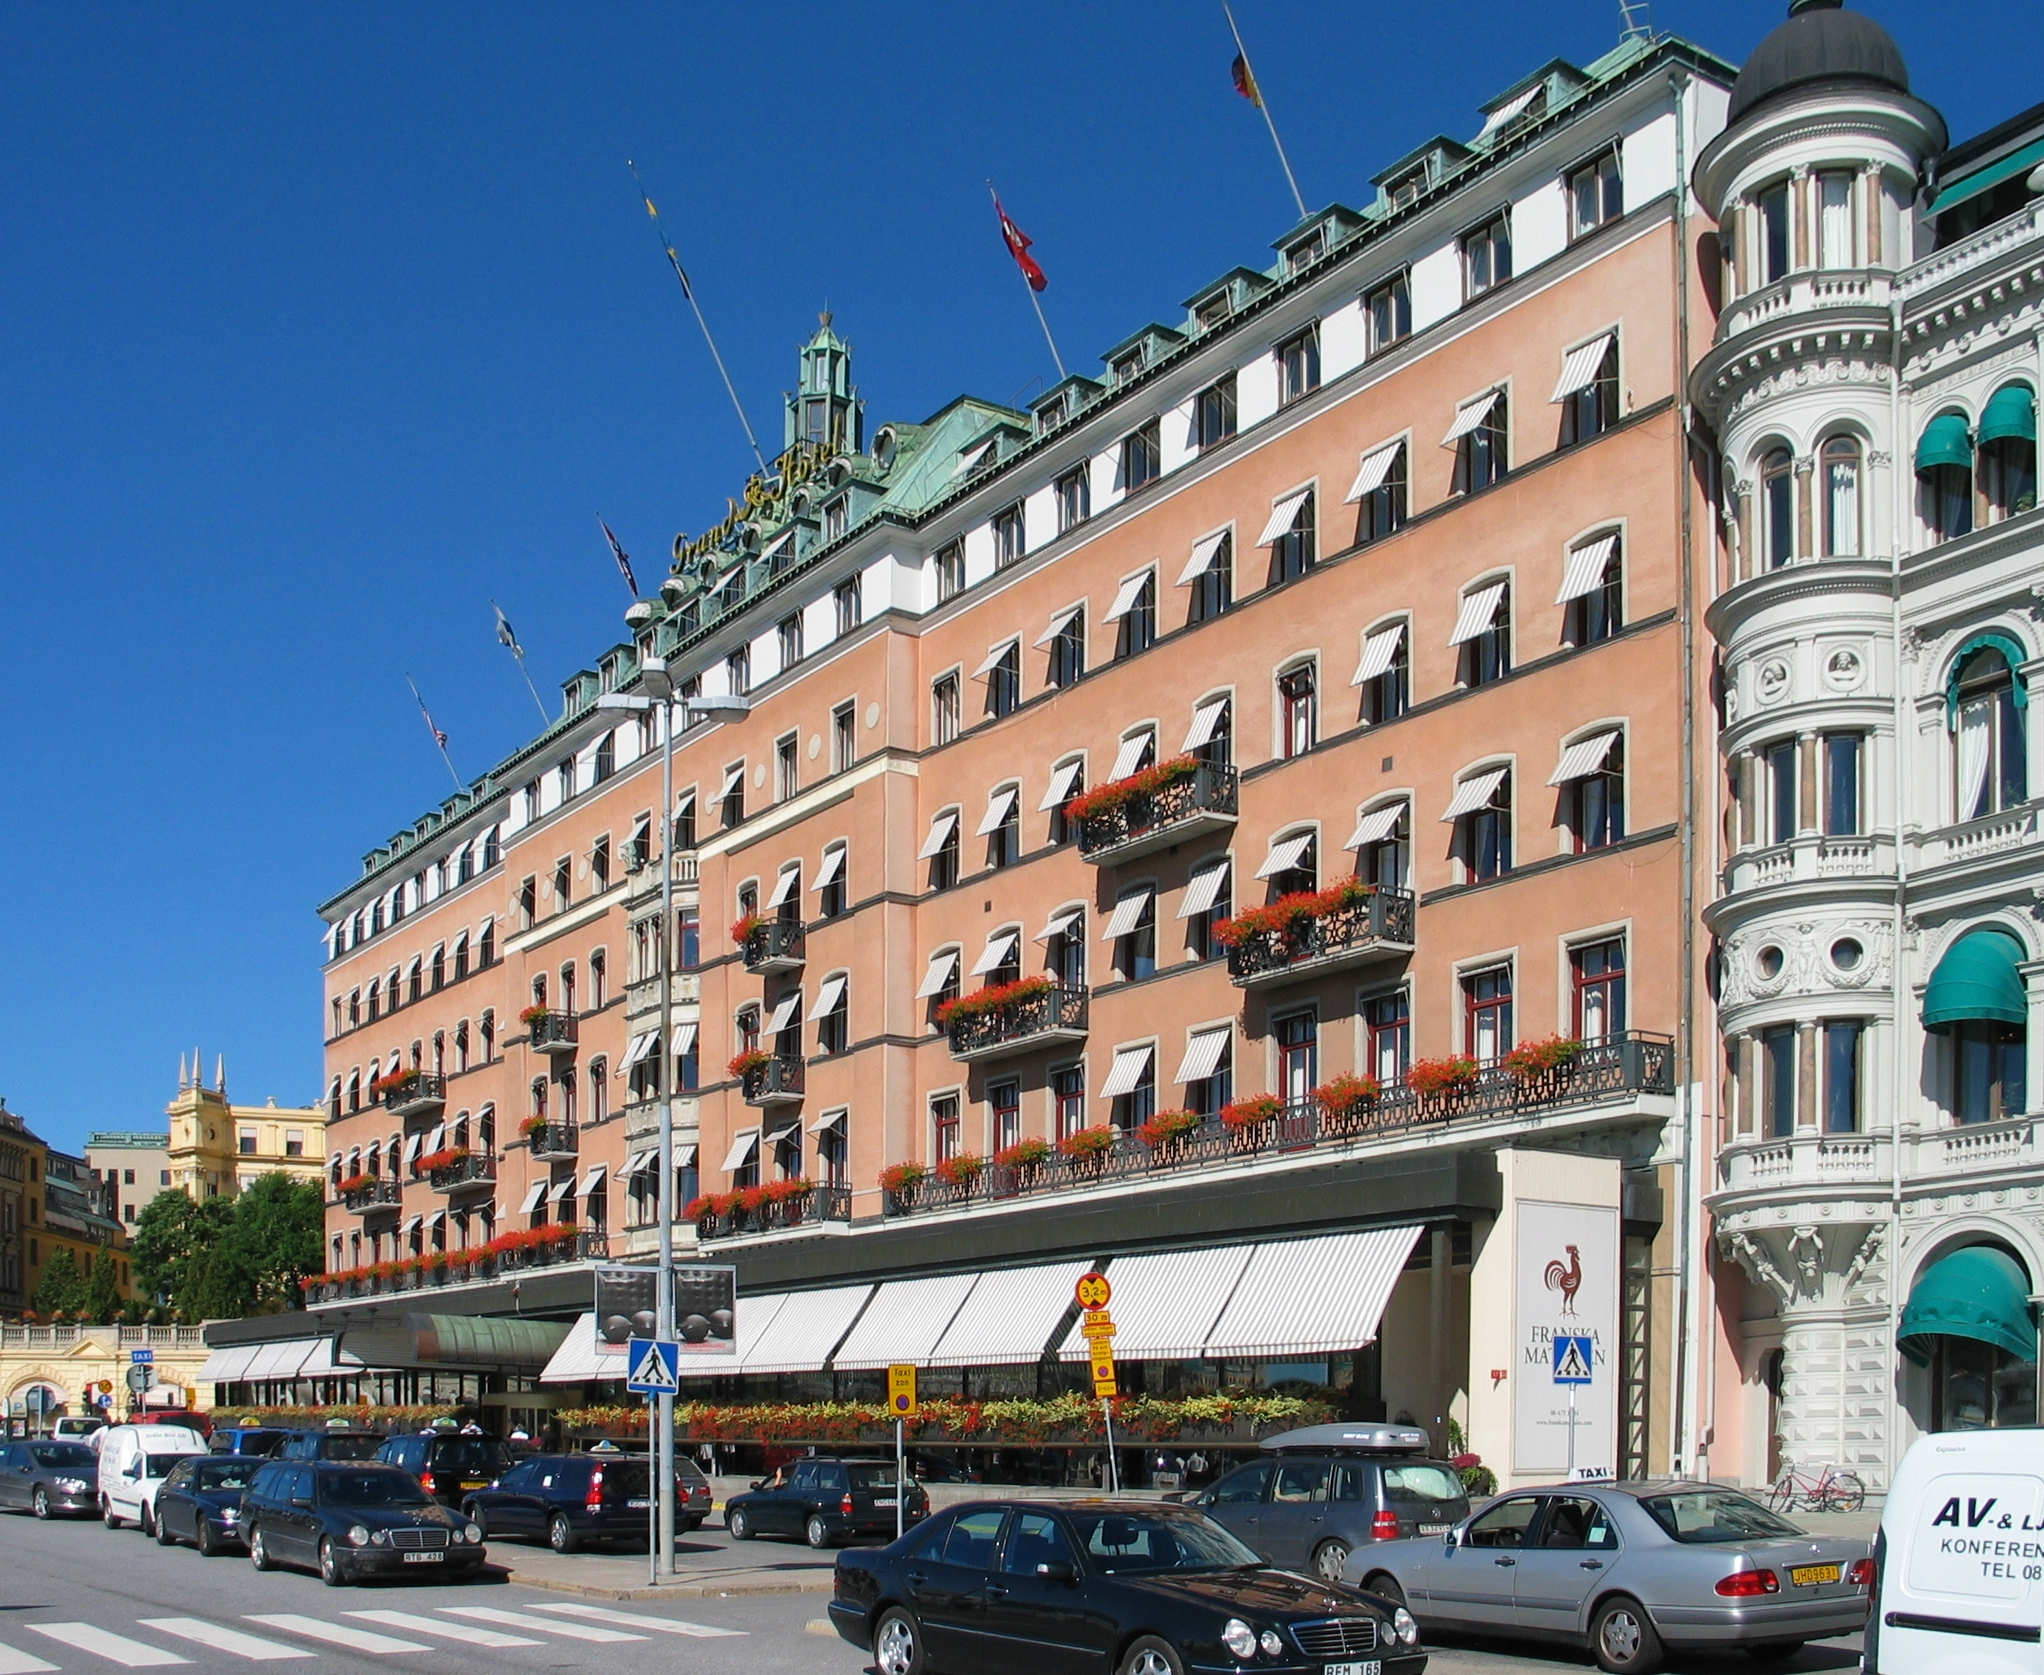 file grand hotel stockholm wikimedia commons. Black Bedroom Furniture Sets. Home Design Ideas